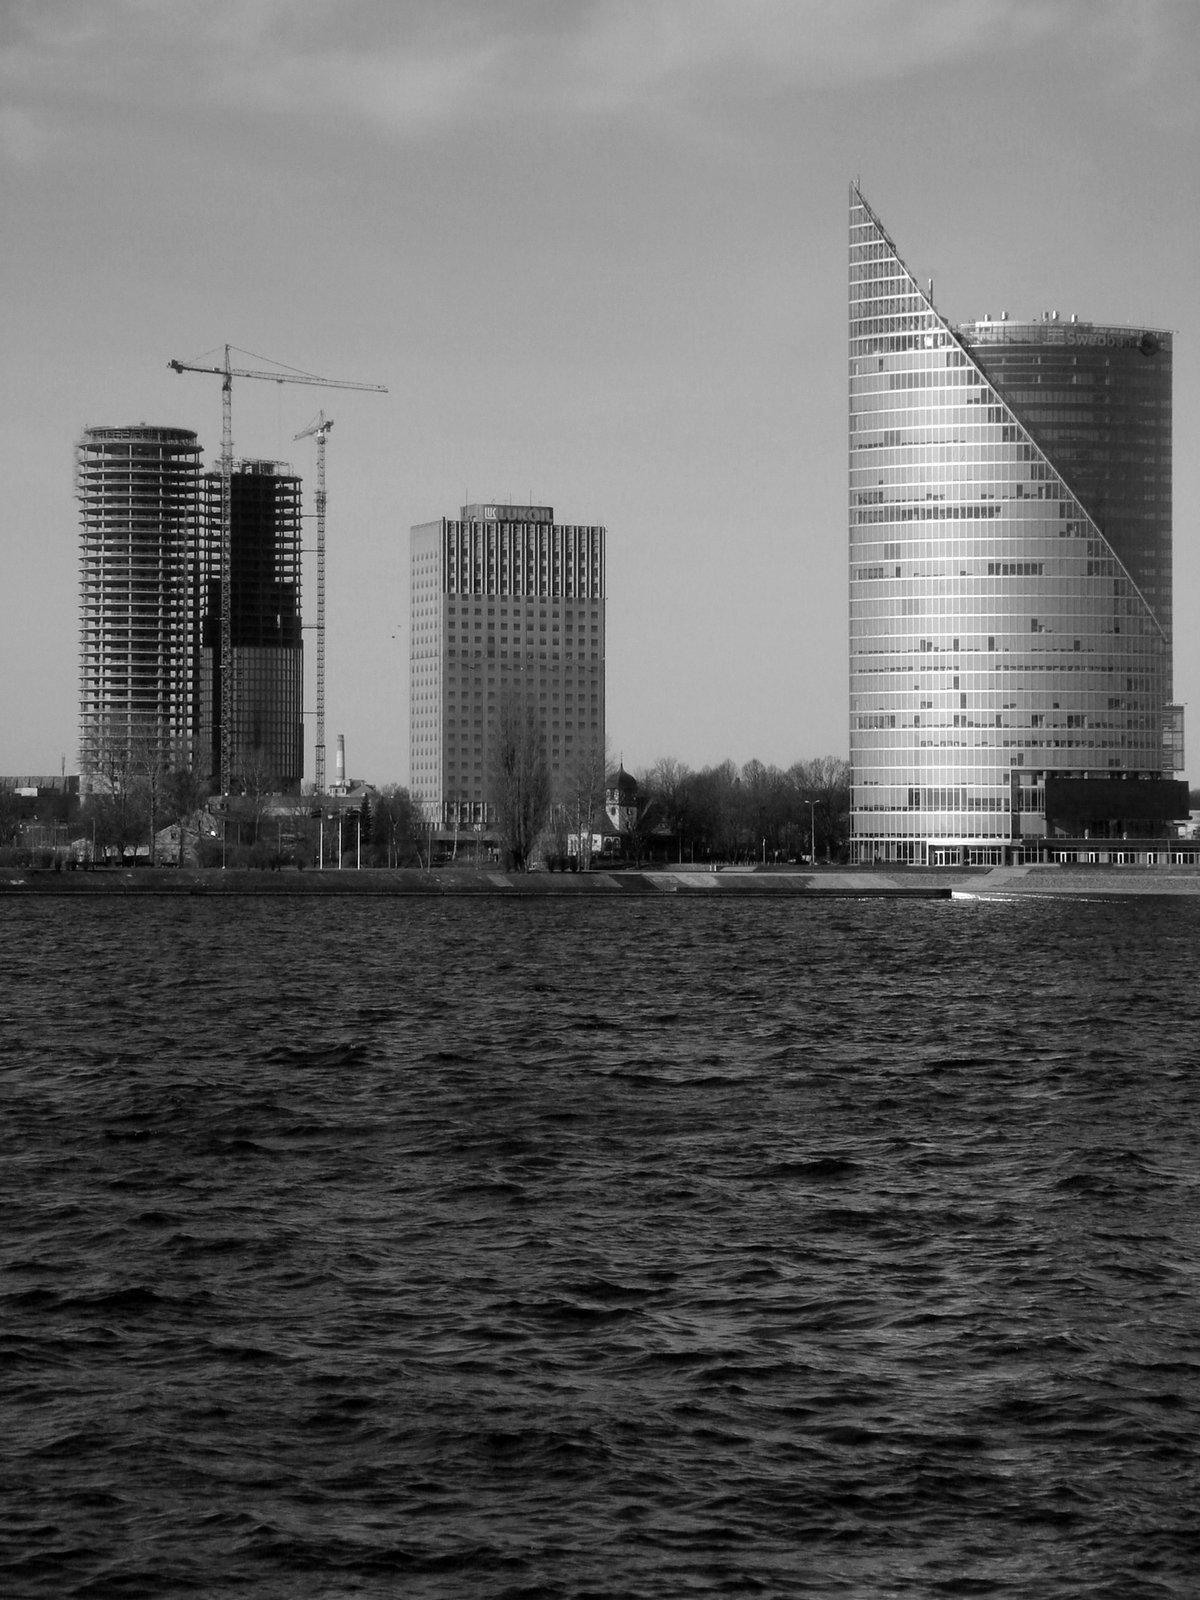 Riga High-Rises  Z-Towers (NRJA, 2004-2015); Preses nams (Jānis Vilciņš, Ābrams Misulovins, 1978); Saules akmens (ZENICO PROJEKTS, TECTUM, 2002-2004).  Photo by: Uldis Lukševics, NRJA  Photo 6 of 7 in Incredible Modernist Architecture From Latvia